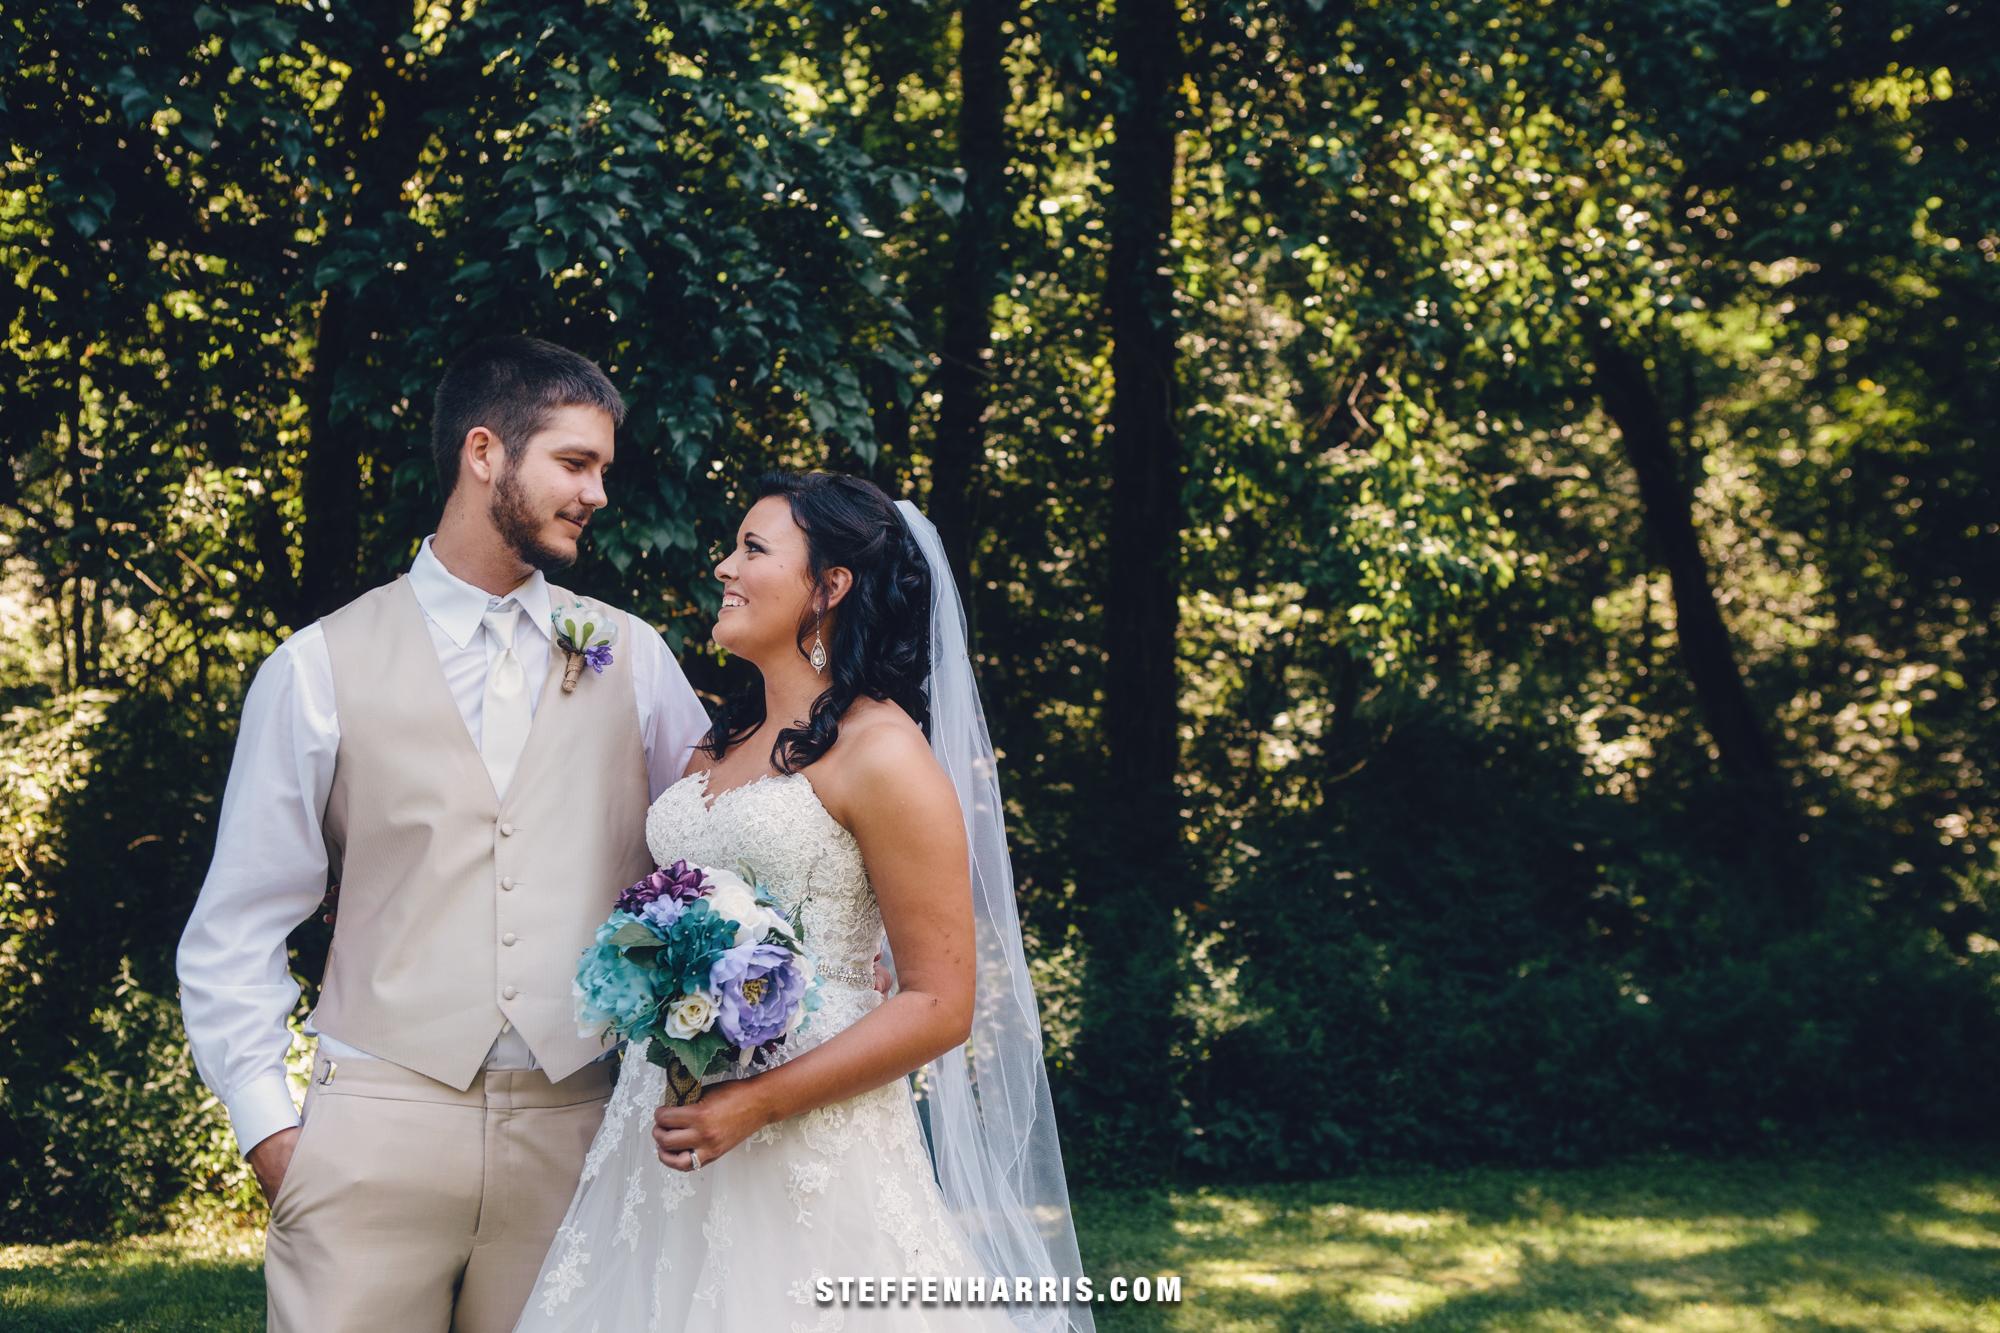 casey-aaron-salem-il-wedding-photography-45